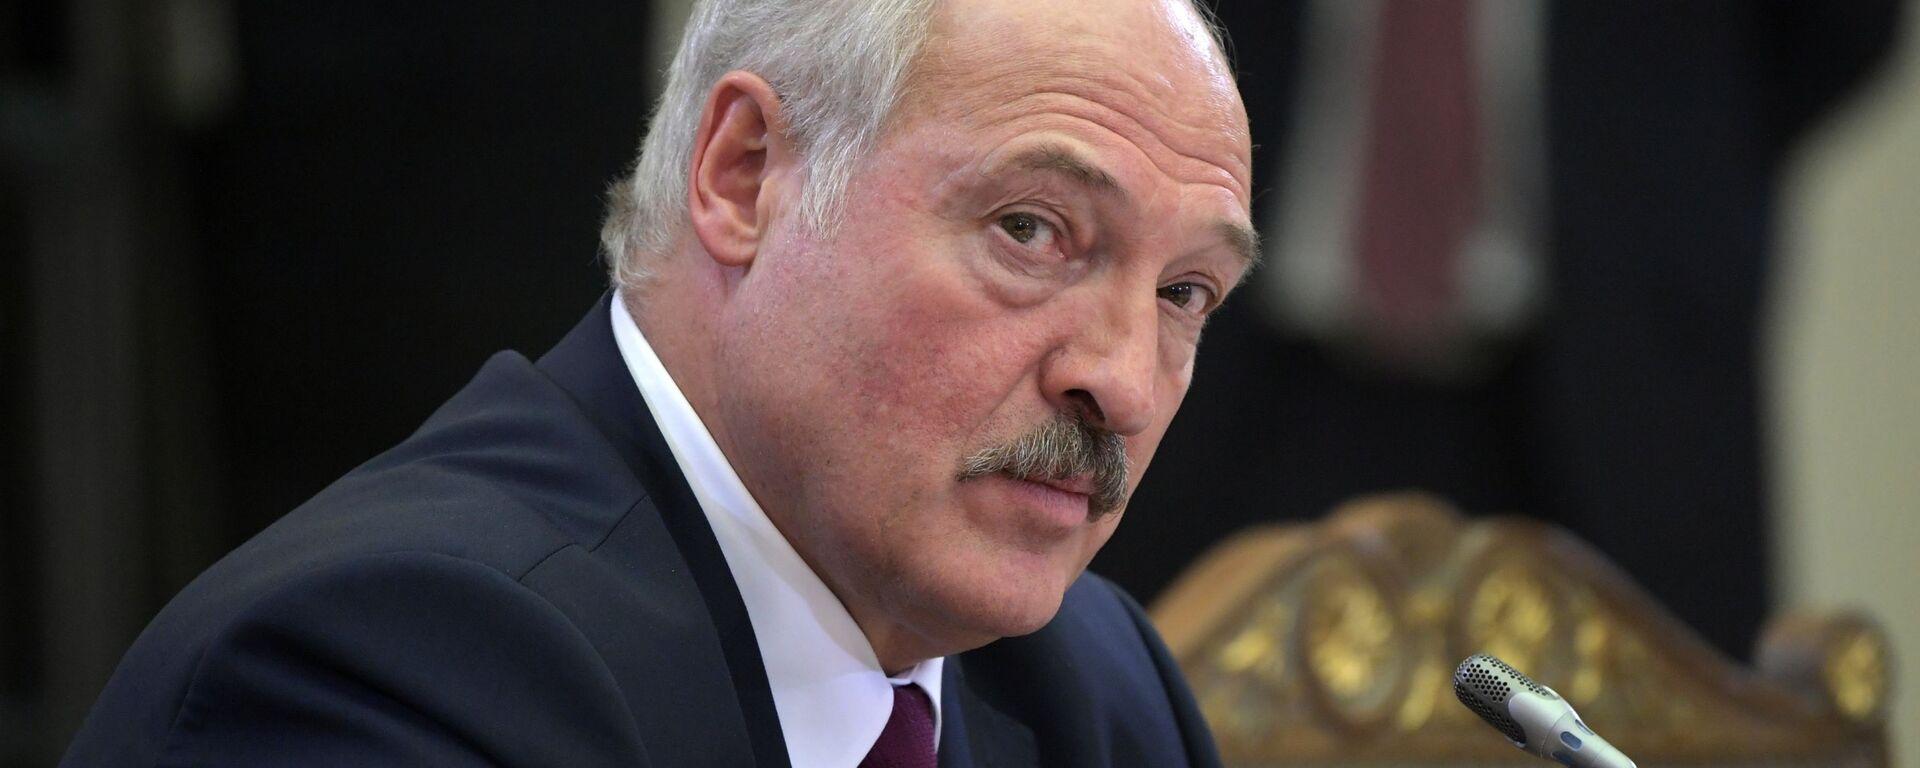 Президент Беларуси Александр Лукашенко - Sputnik Latvija, 1920, 06.05.2021